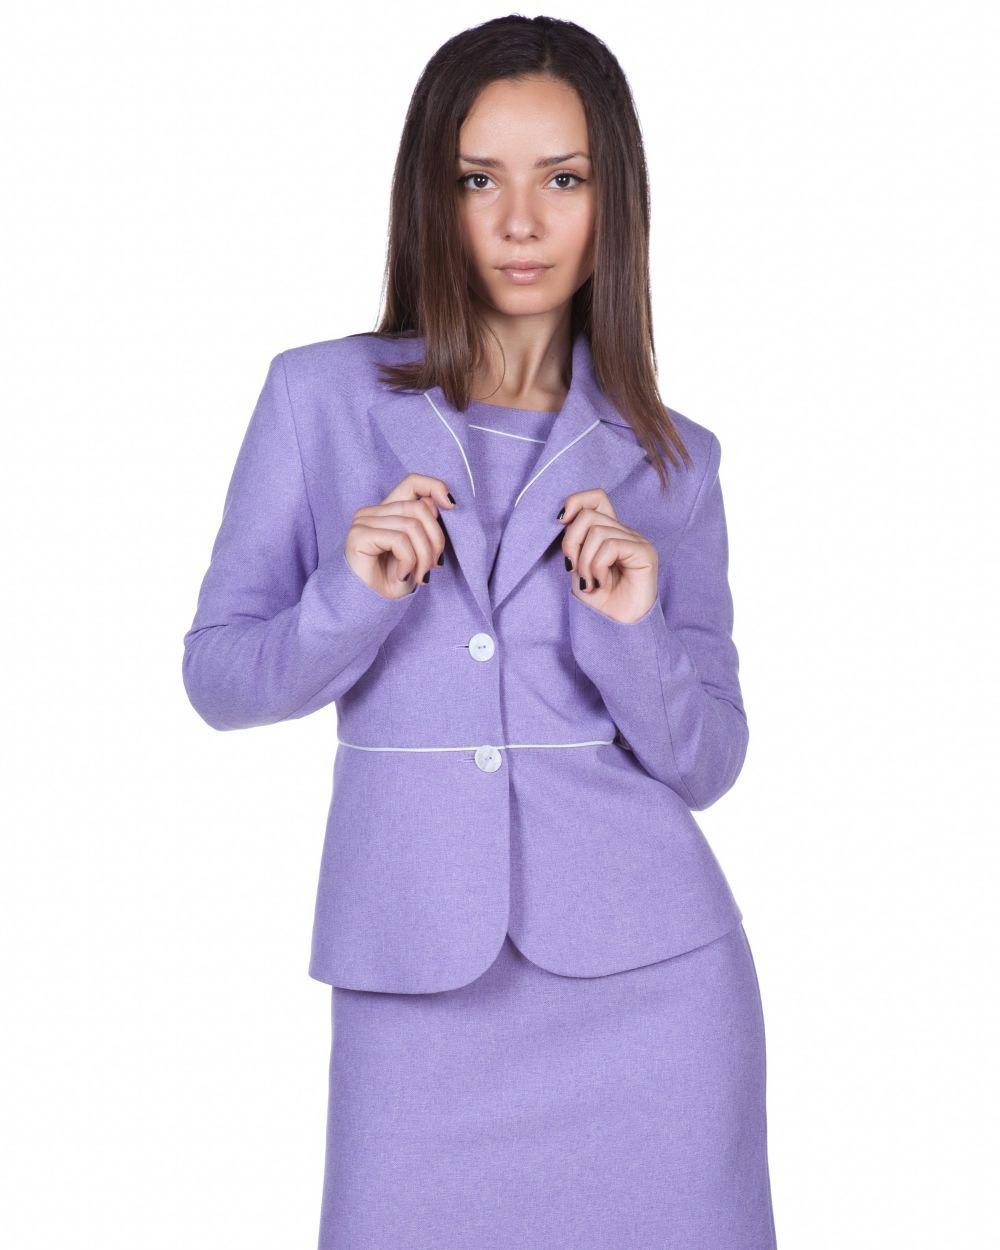 Дамско сако Punkt от efrea.com #efrea #fashion #violet